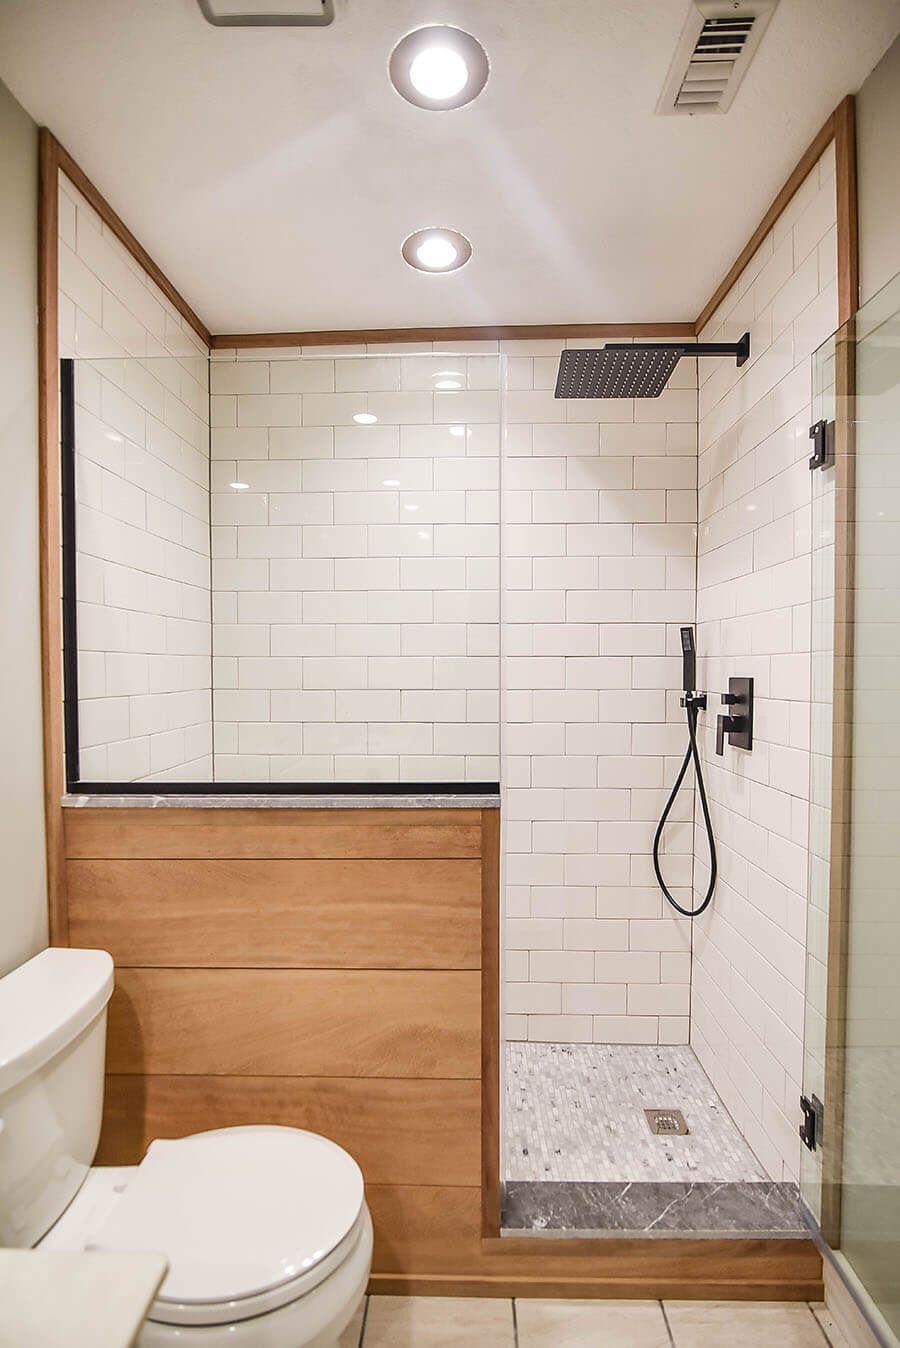 27 Truly Inspiring Modern Bathroom Ideas For Your Private Oasis Simple Bathroom Bathroom Design Small Modern Simple Bathroom Designs